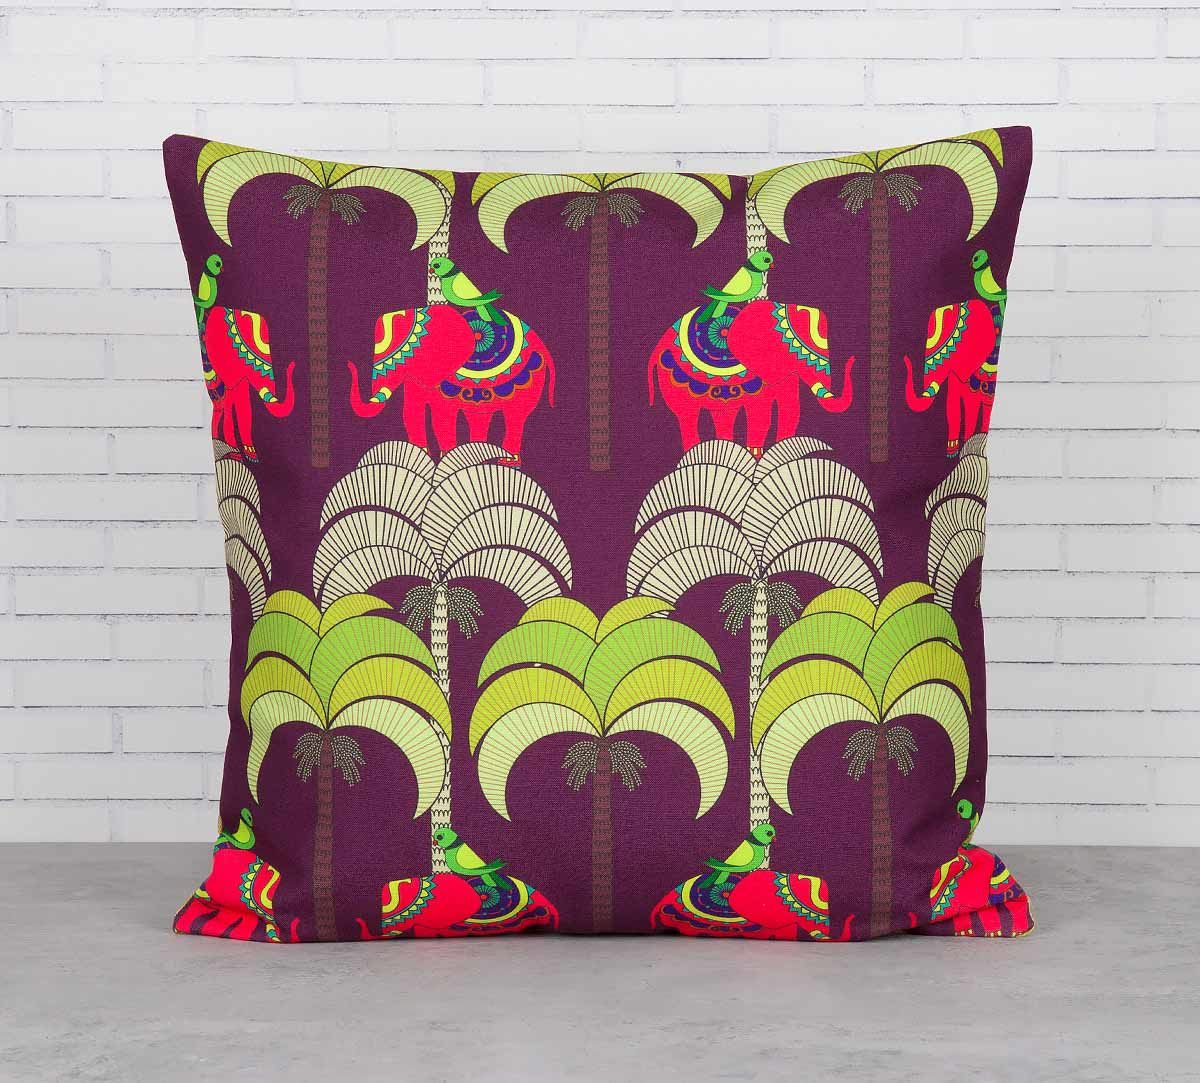 India Circus Palmeria Tusker Reiteration Cushion Cover